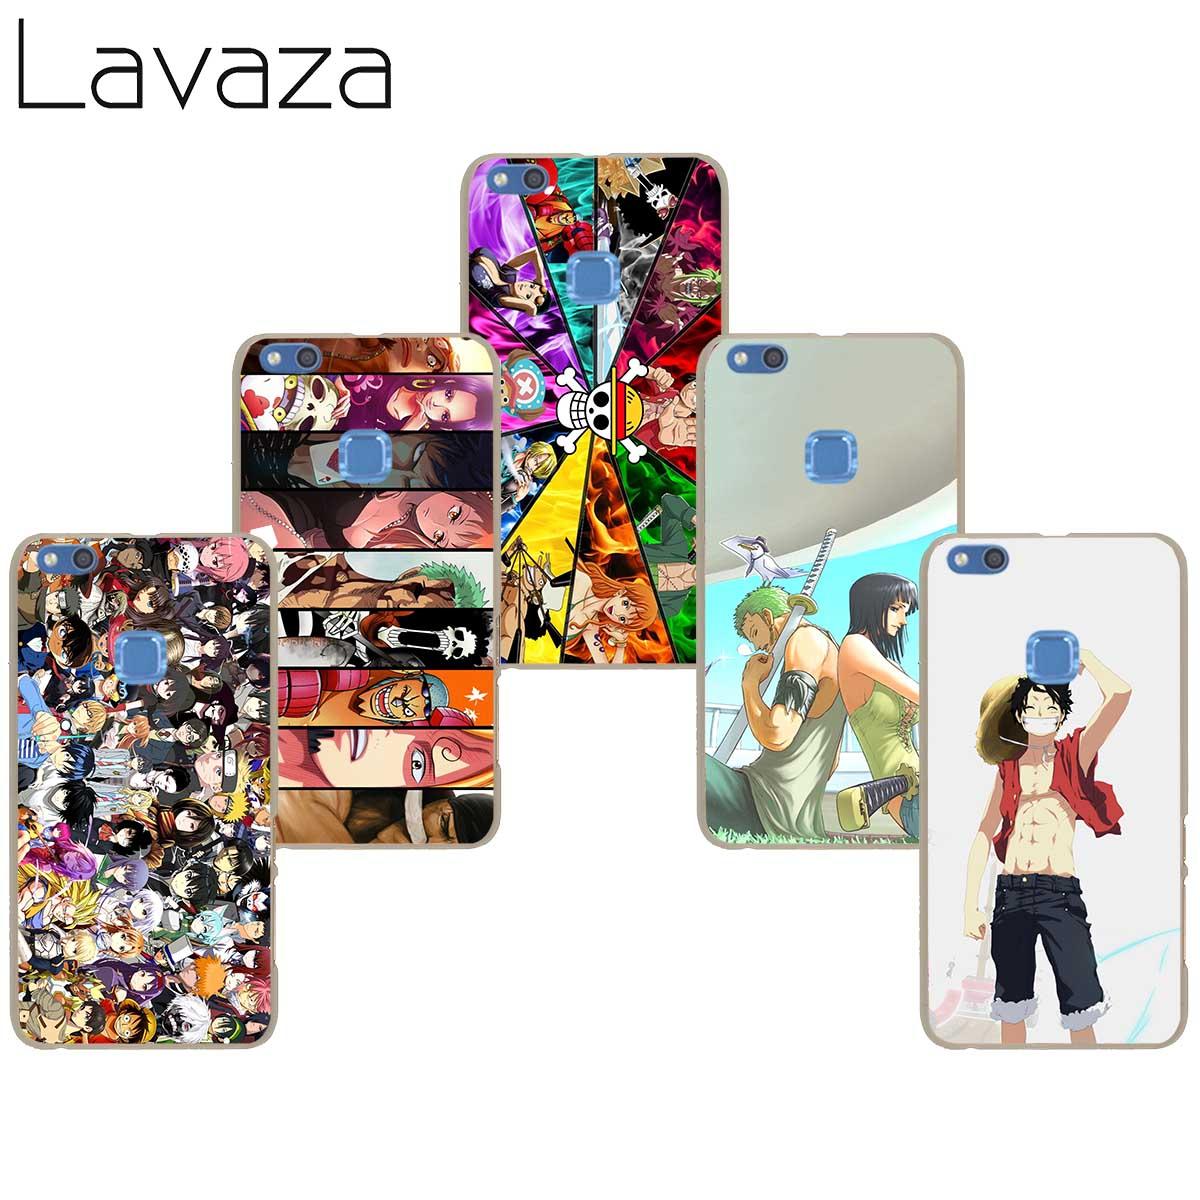 Lavaza 51aa Janpanese Anime Monkey D Luffy Hard case for Huawei P8 P9 P10 lite mini Plus ...